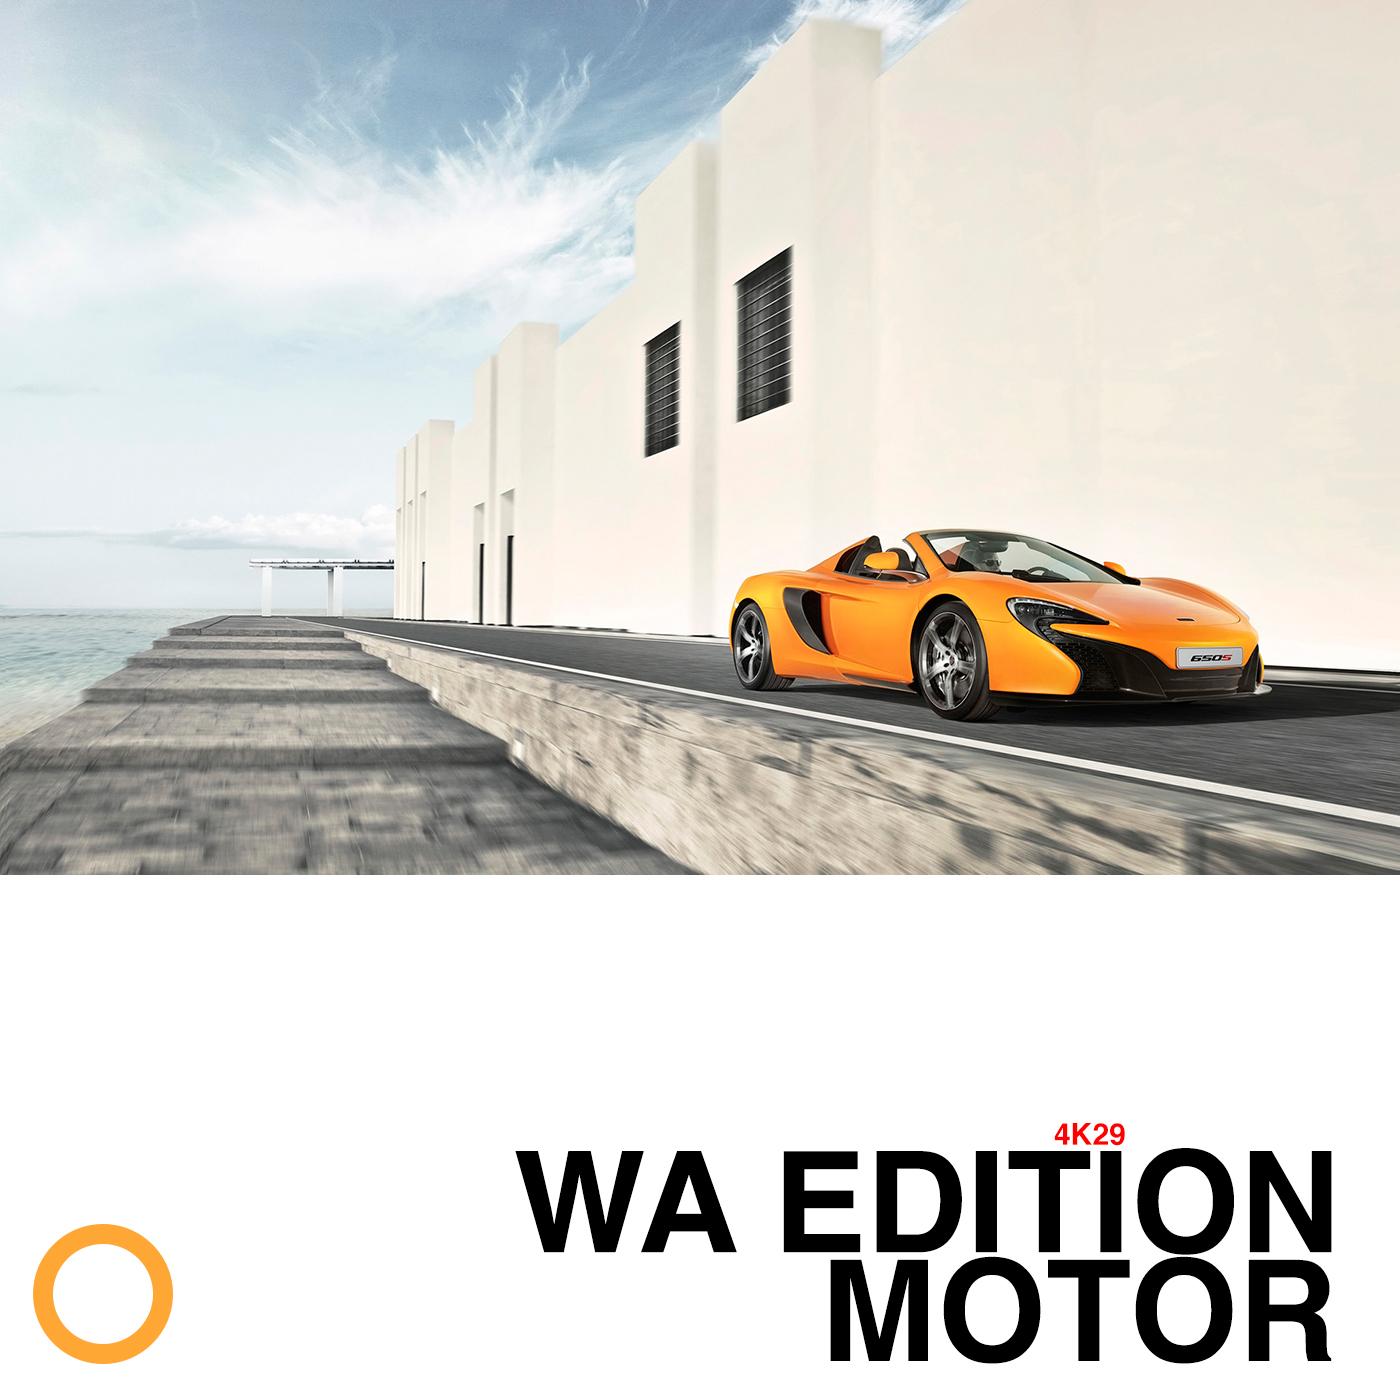 WA EDITION MOTOR 4K29